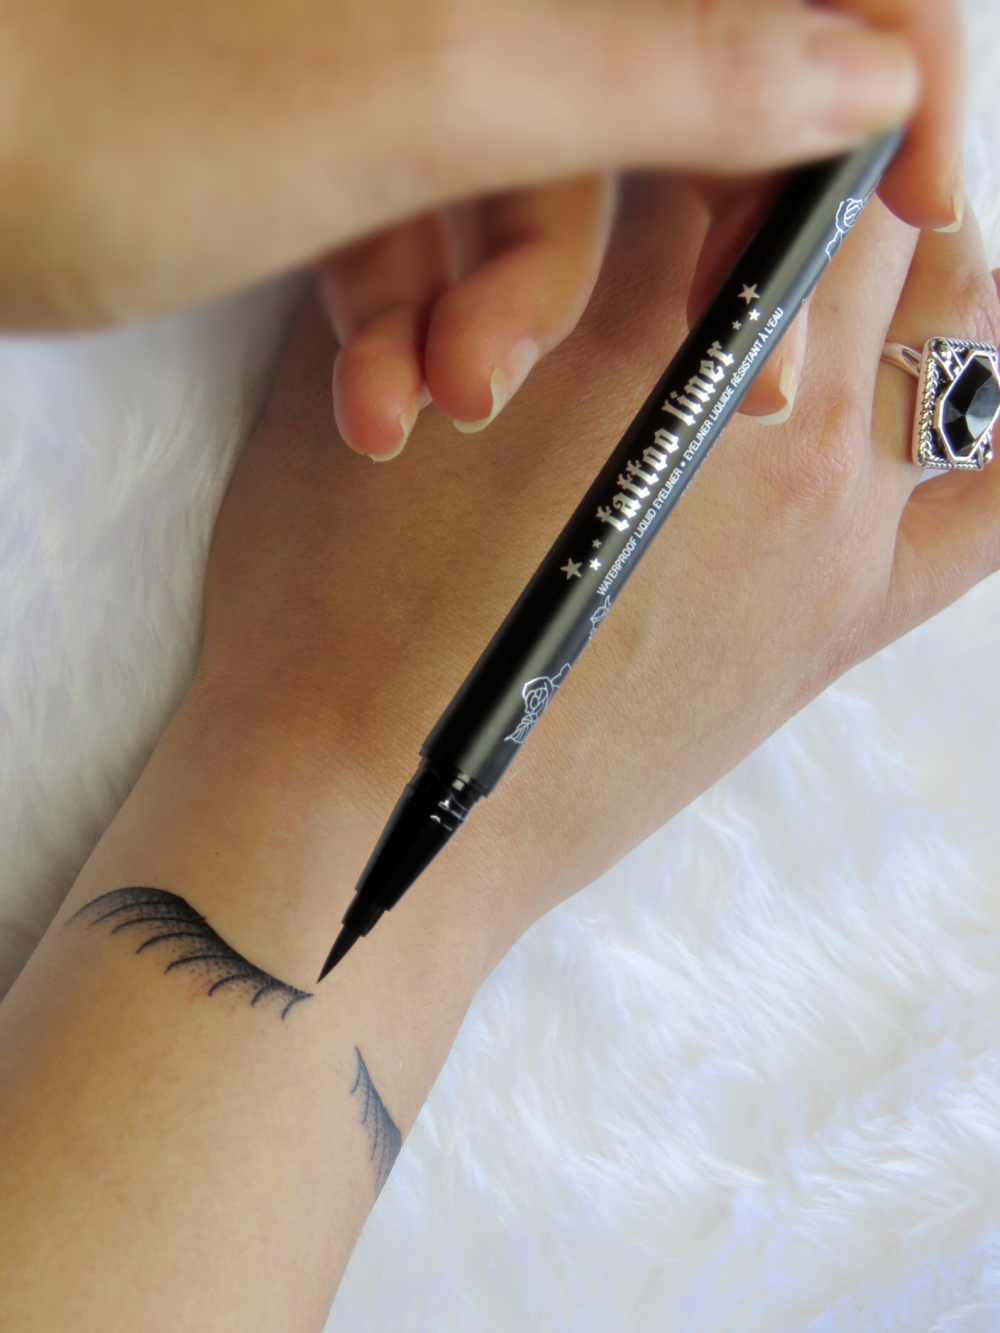 trooper-tatto-liner.JPG